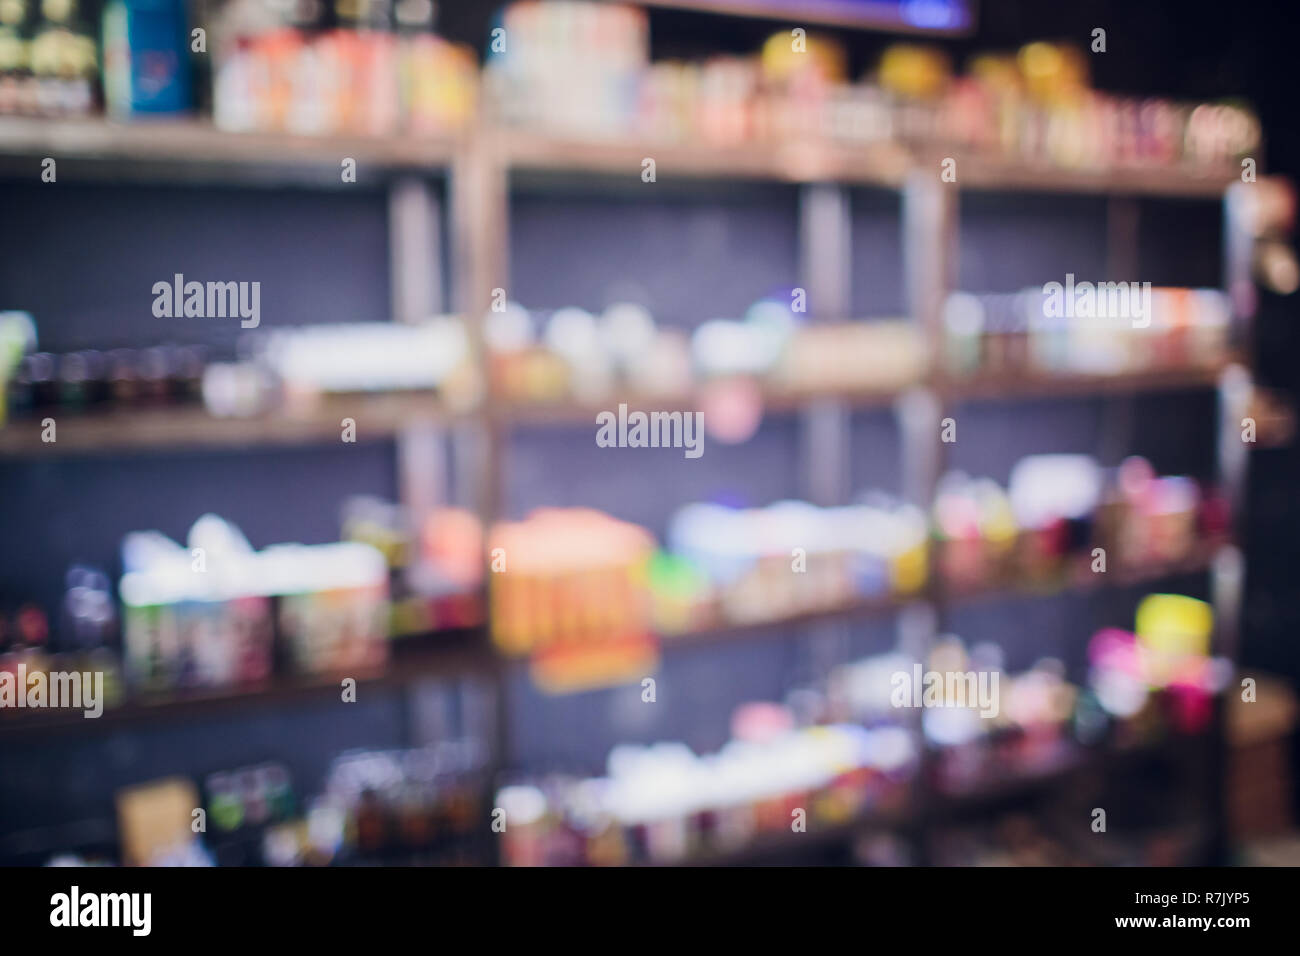 vape shop blurred background - Stock Image